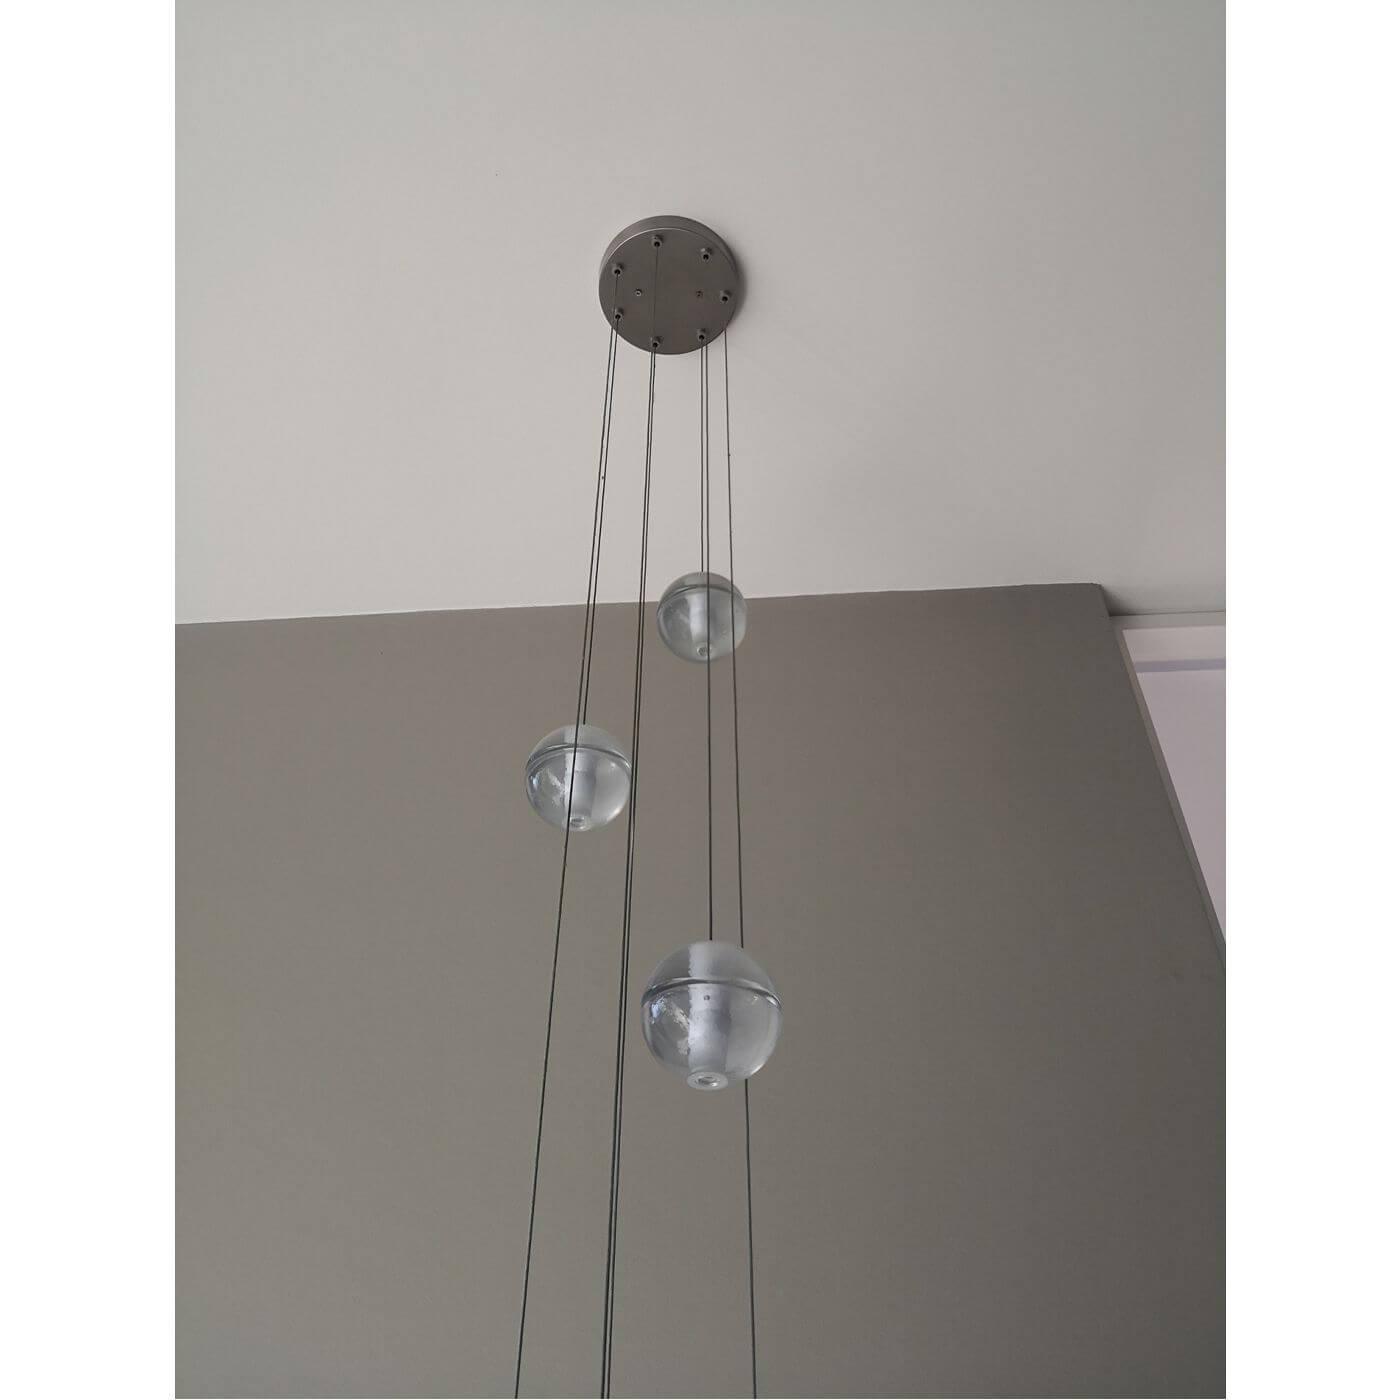 Bocci 14.7 ball pendant light